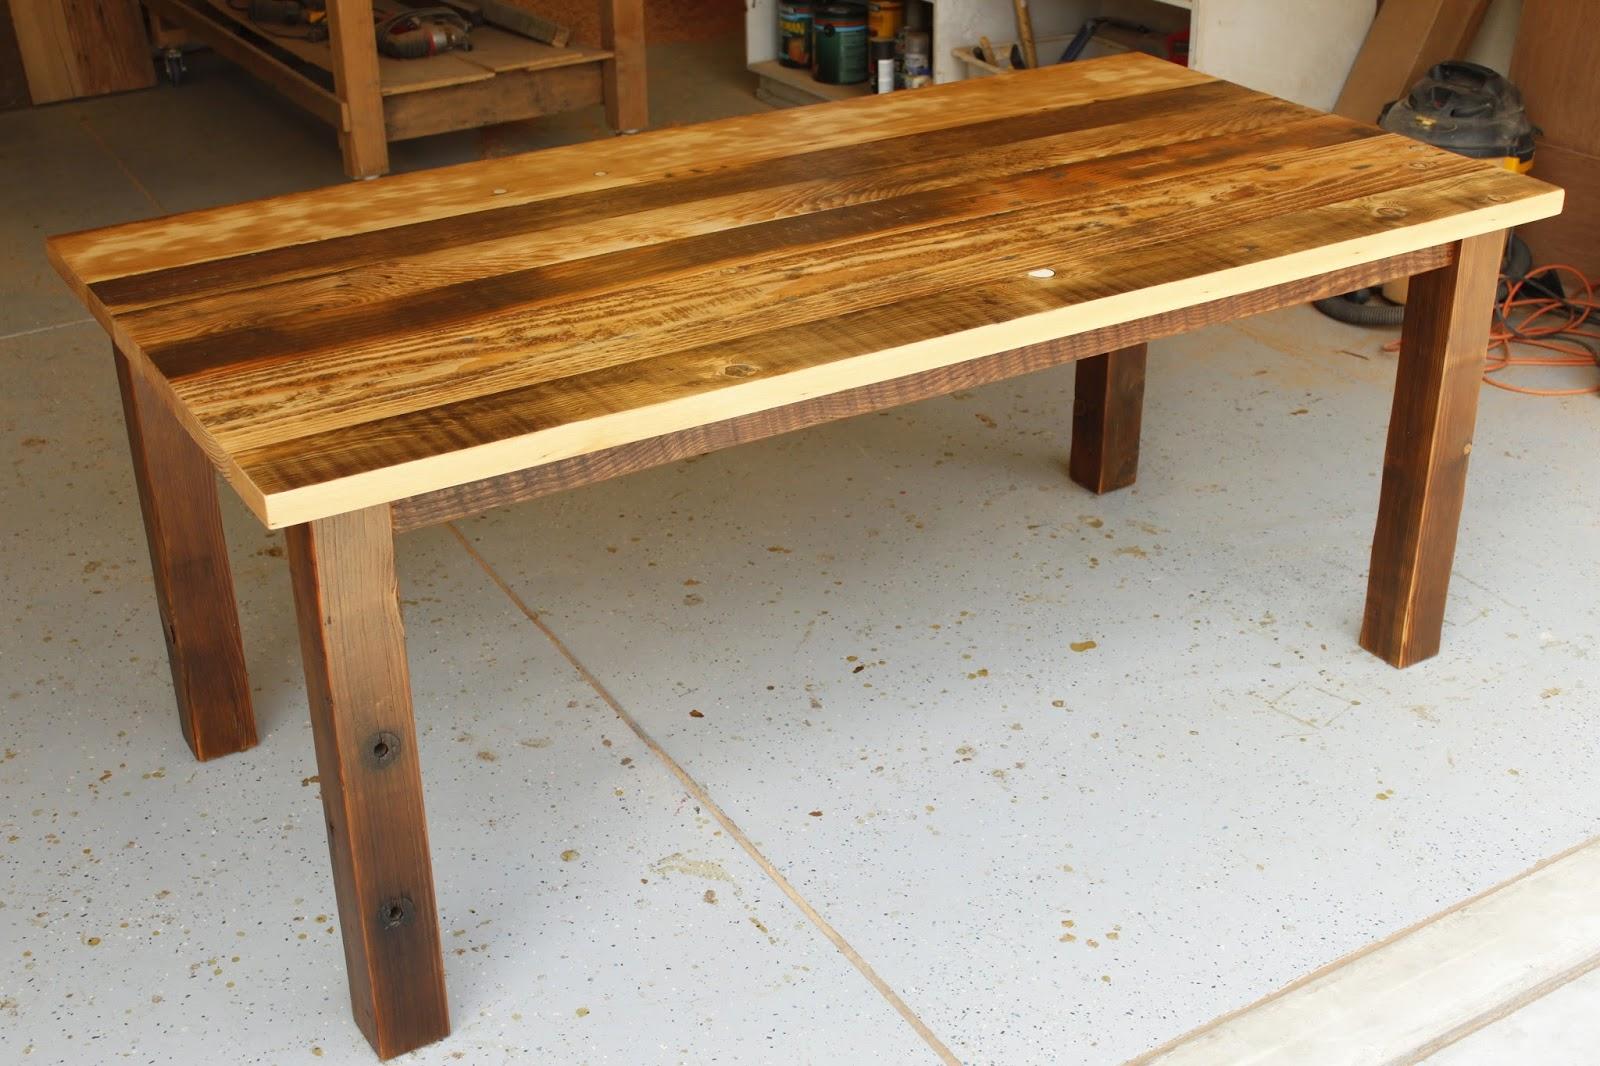 Arbor Exchange Reclaimed Wood Furniture Patchwork Of Reclaimed Douglas Fir